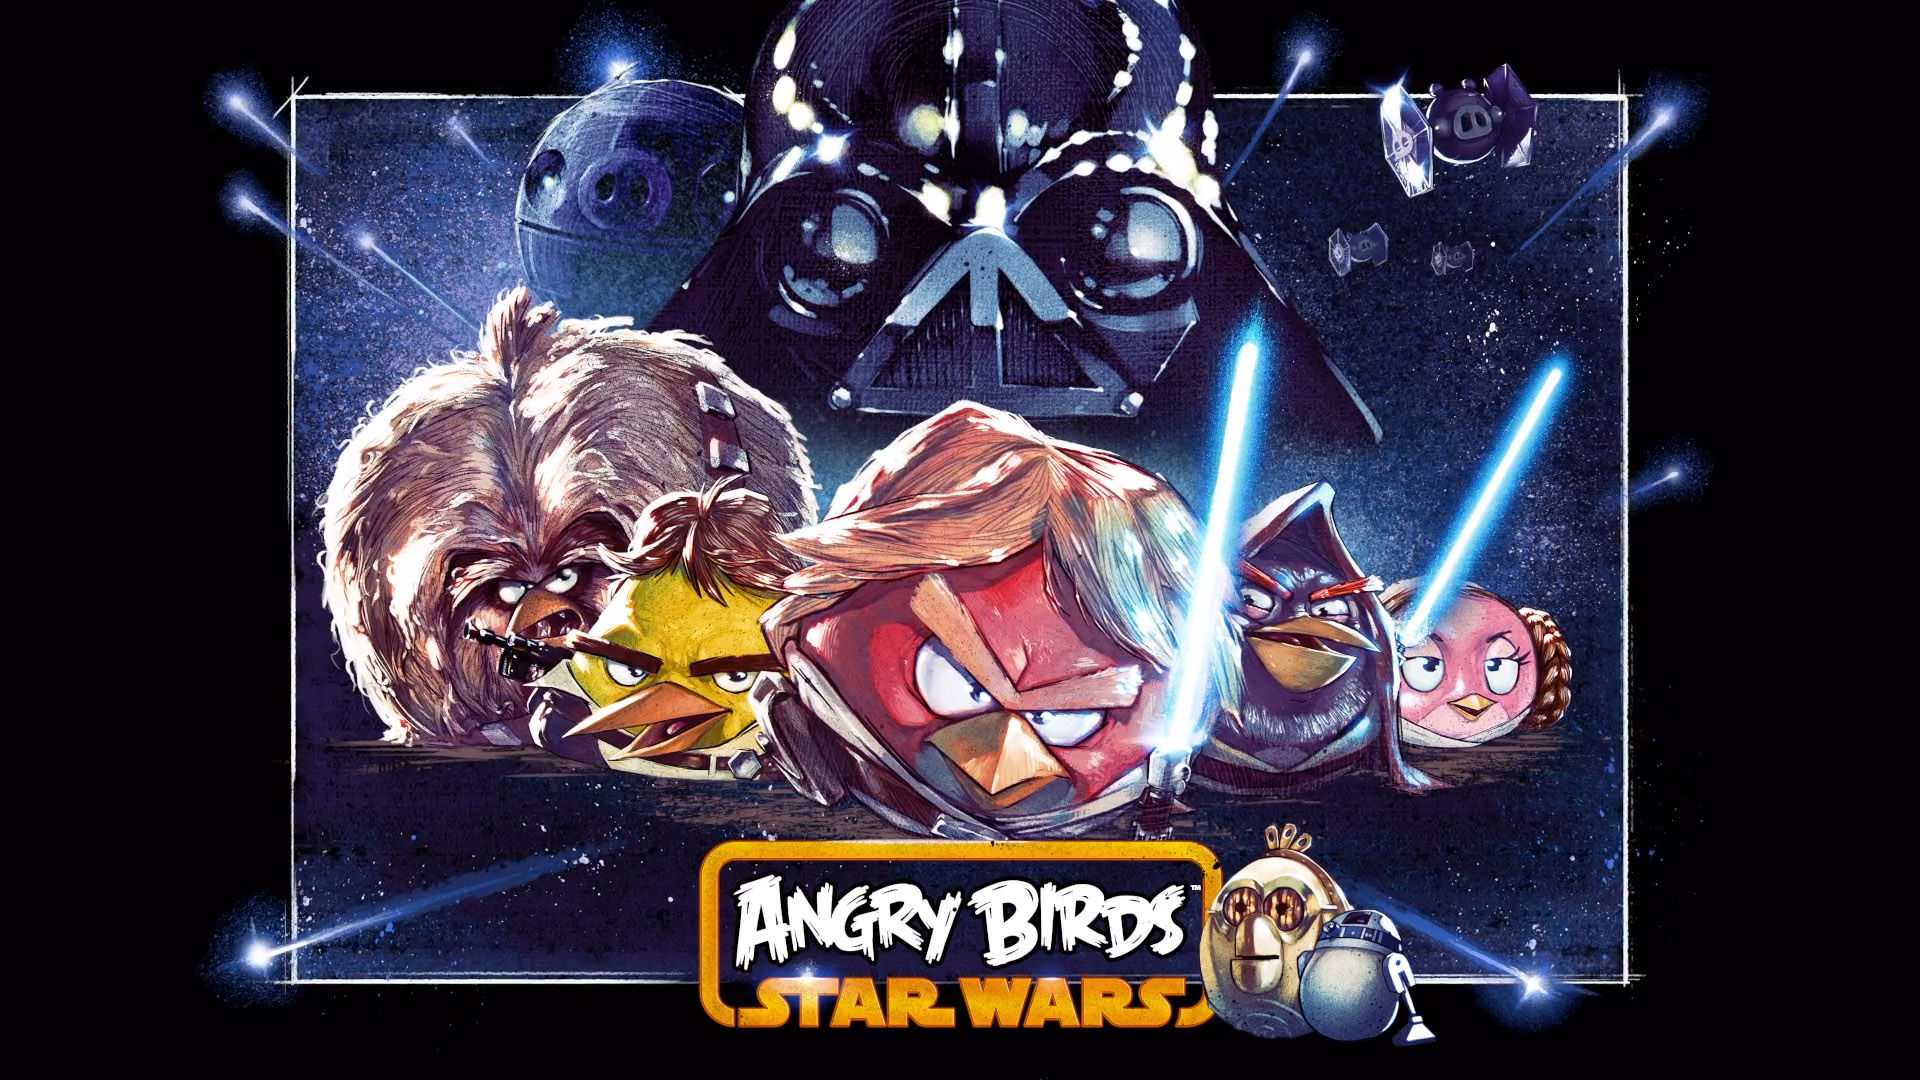 Angry birds star wars ofrece actualmente más de 80 niveles angry